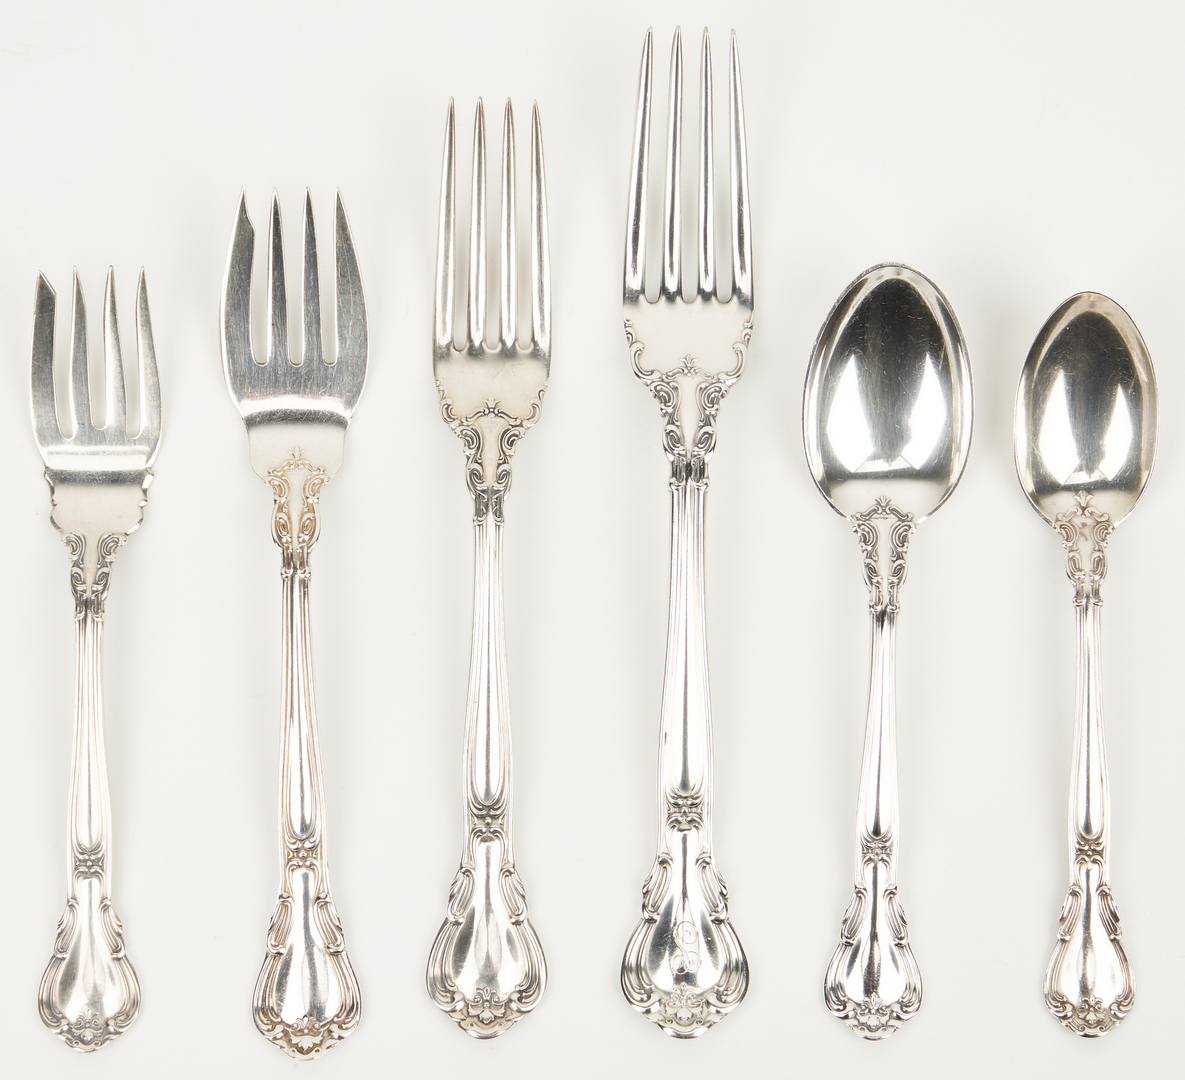 Lot 60: 153 Pcs. Gorham Chantilly Sterling Silver Flatware